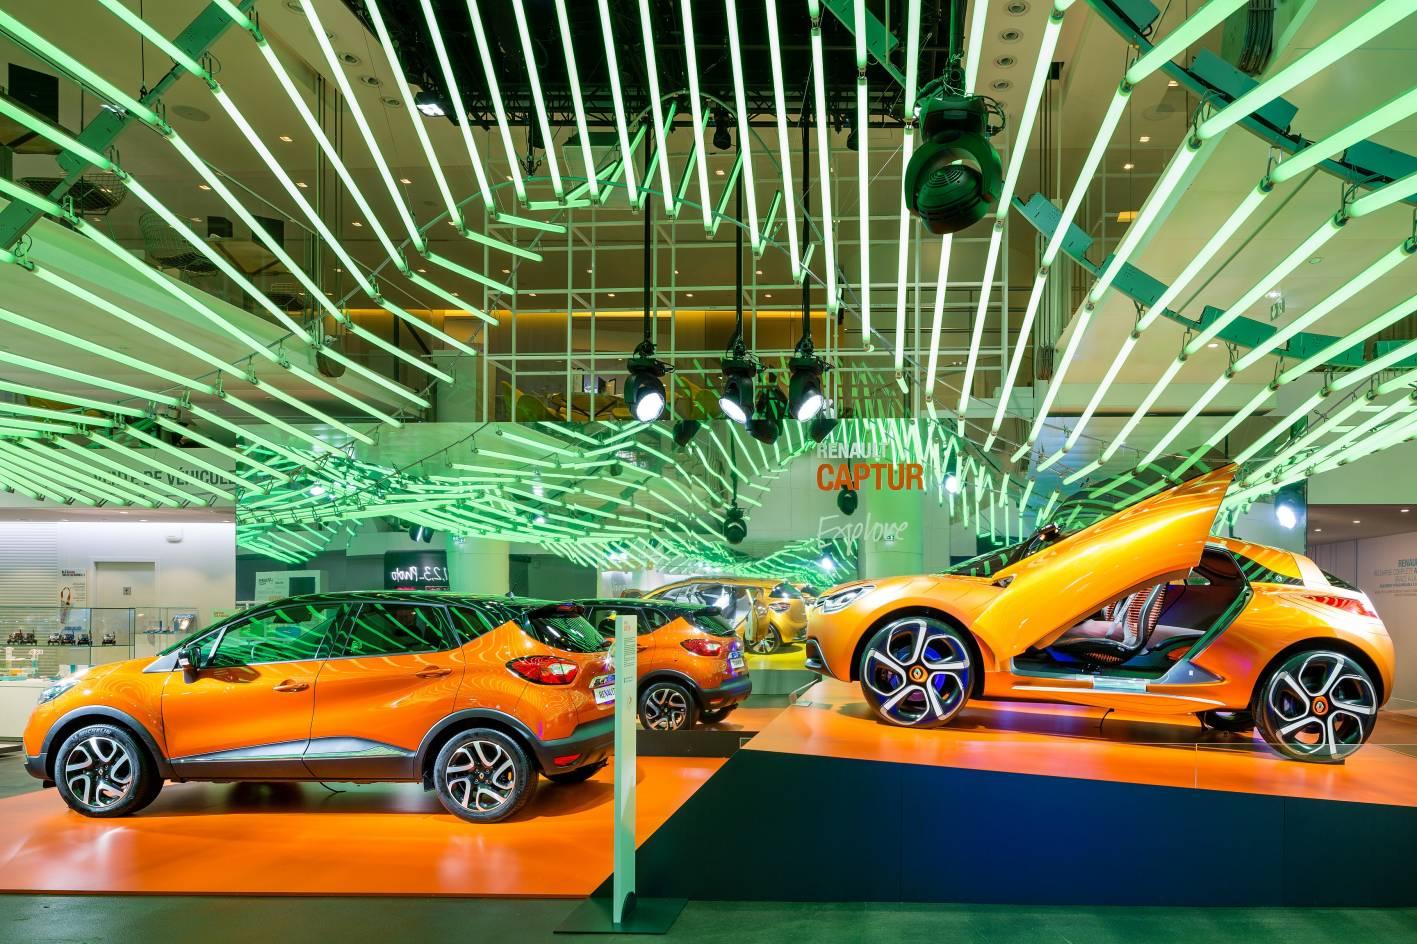 [Image: Renault-Design-Color-Manifesto-Captur-and-concept-1.jpg]